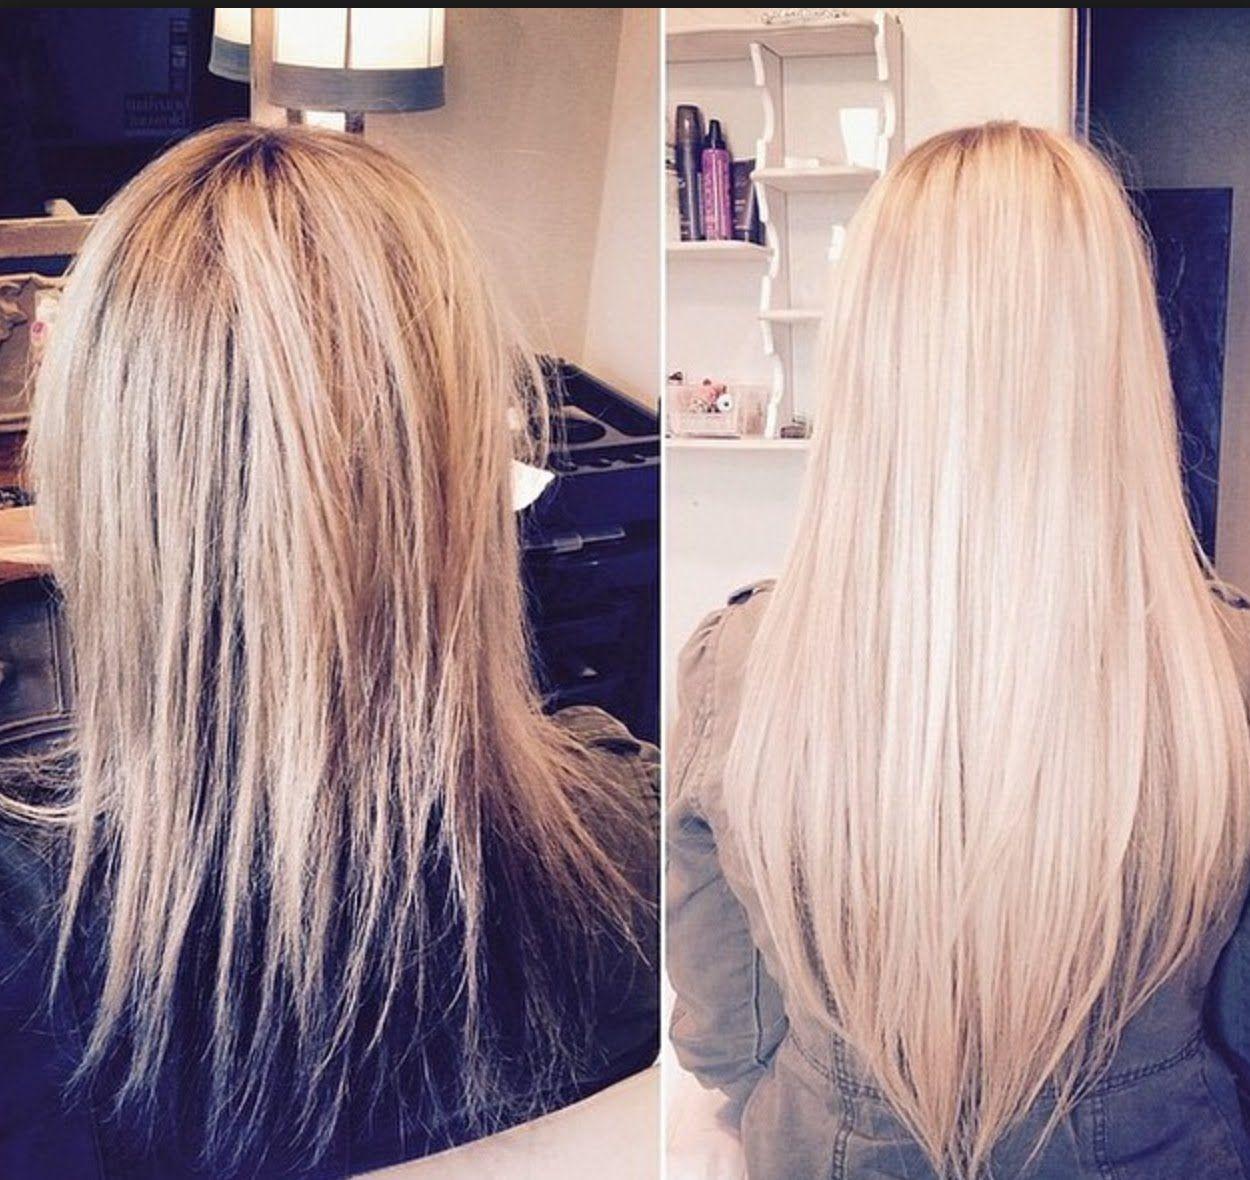 Hair Extensions For Thin Hair Beauty Help Pinterest Thin Hair